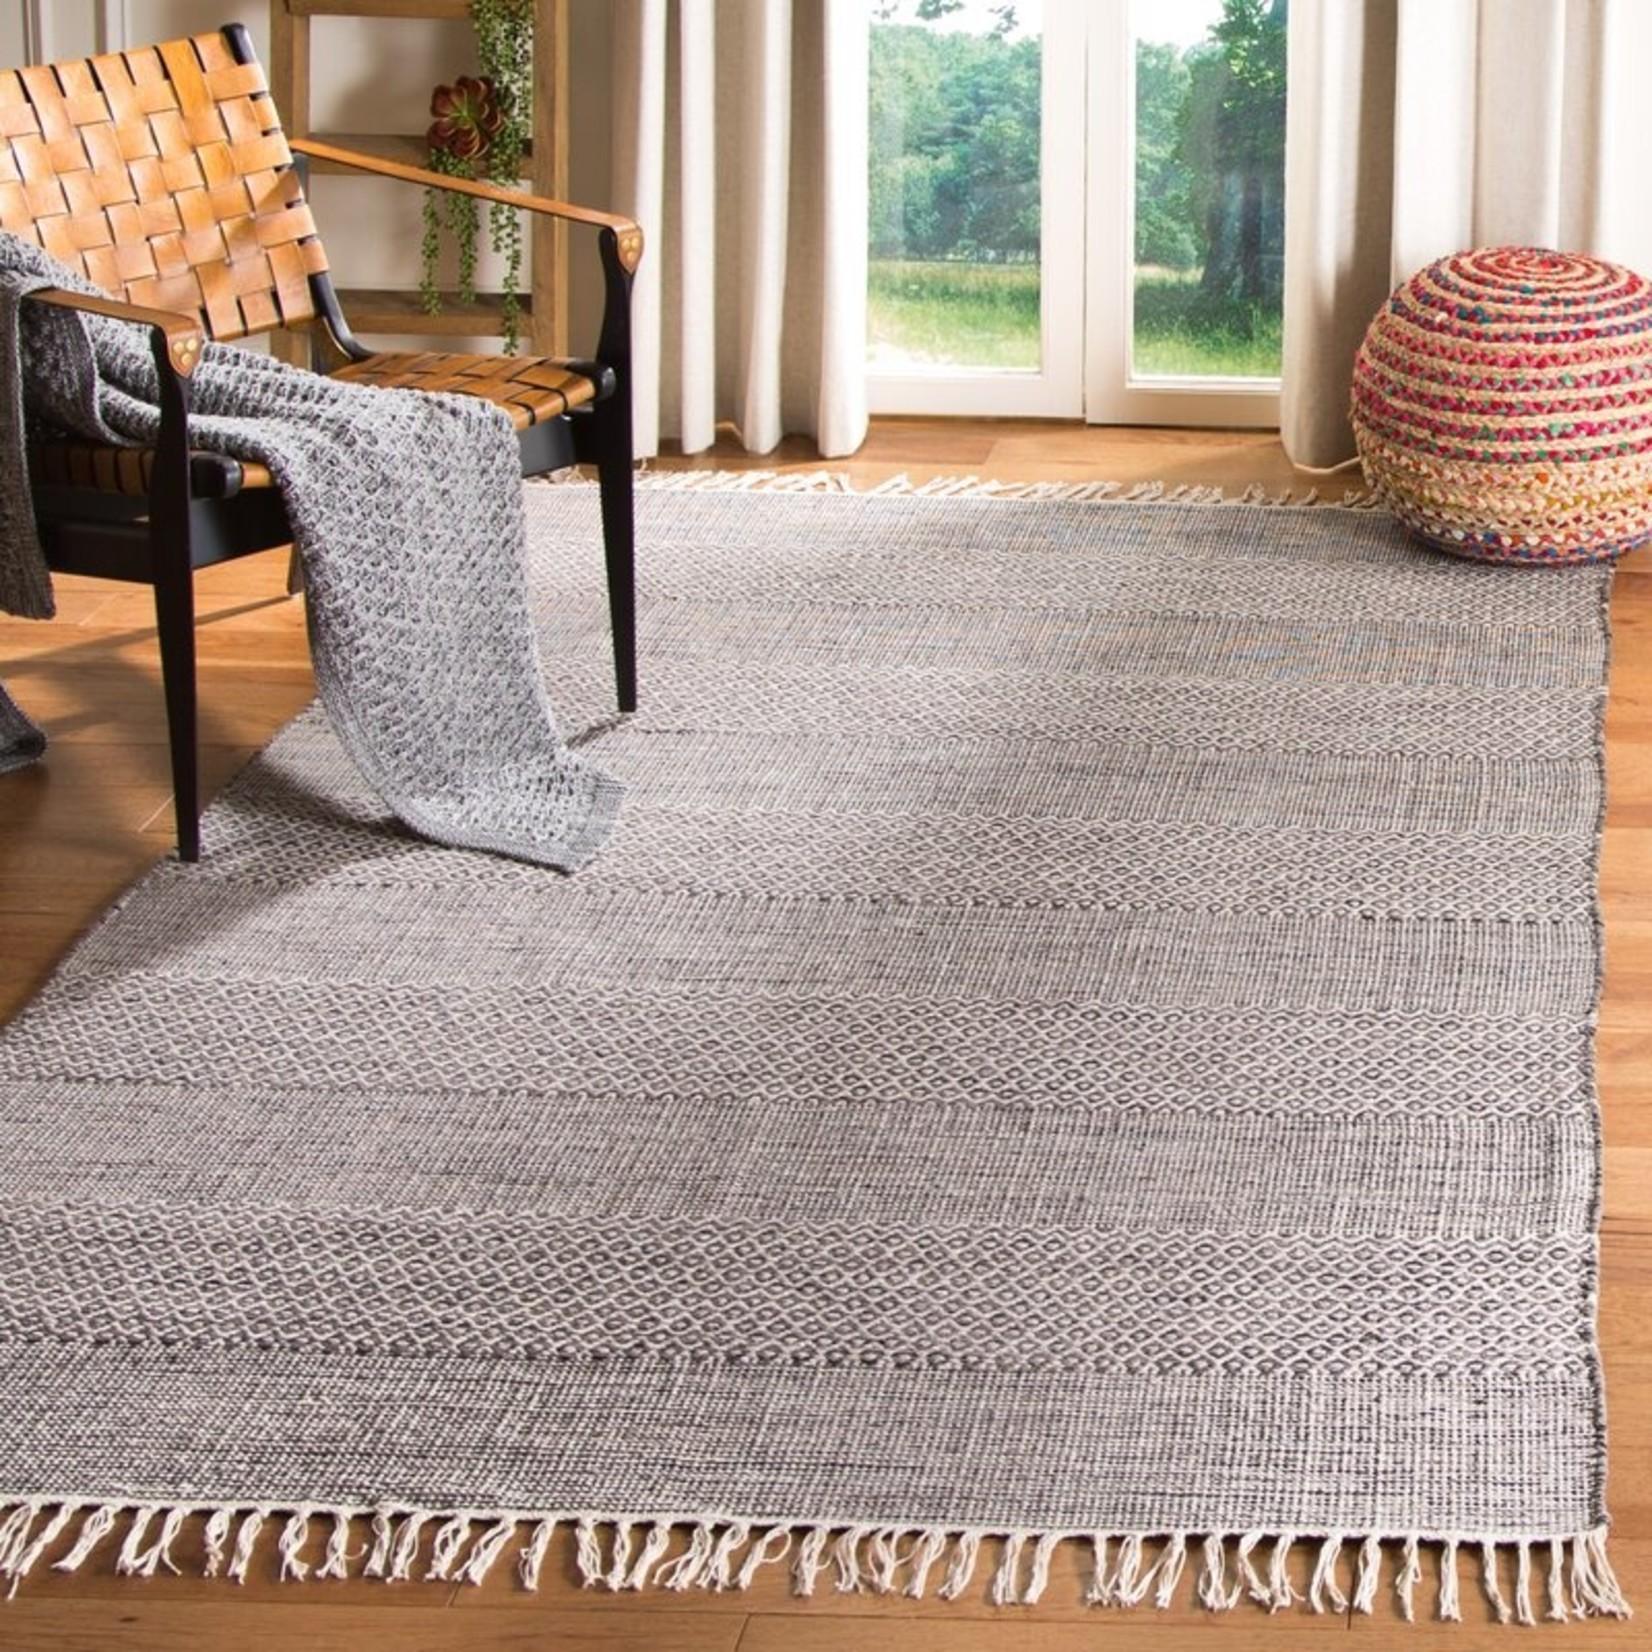 *4' x 6' -  Jodi Striped Handmade Flatweave Cotton Ivory/Anthracite Area Rug